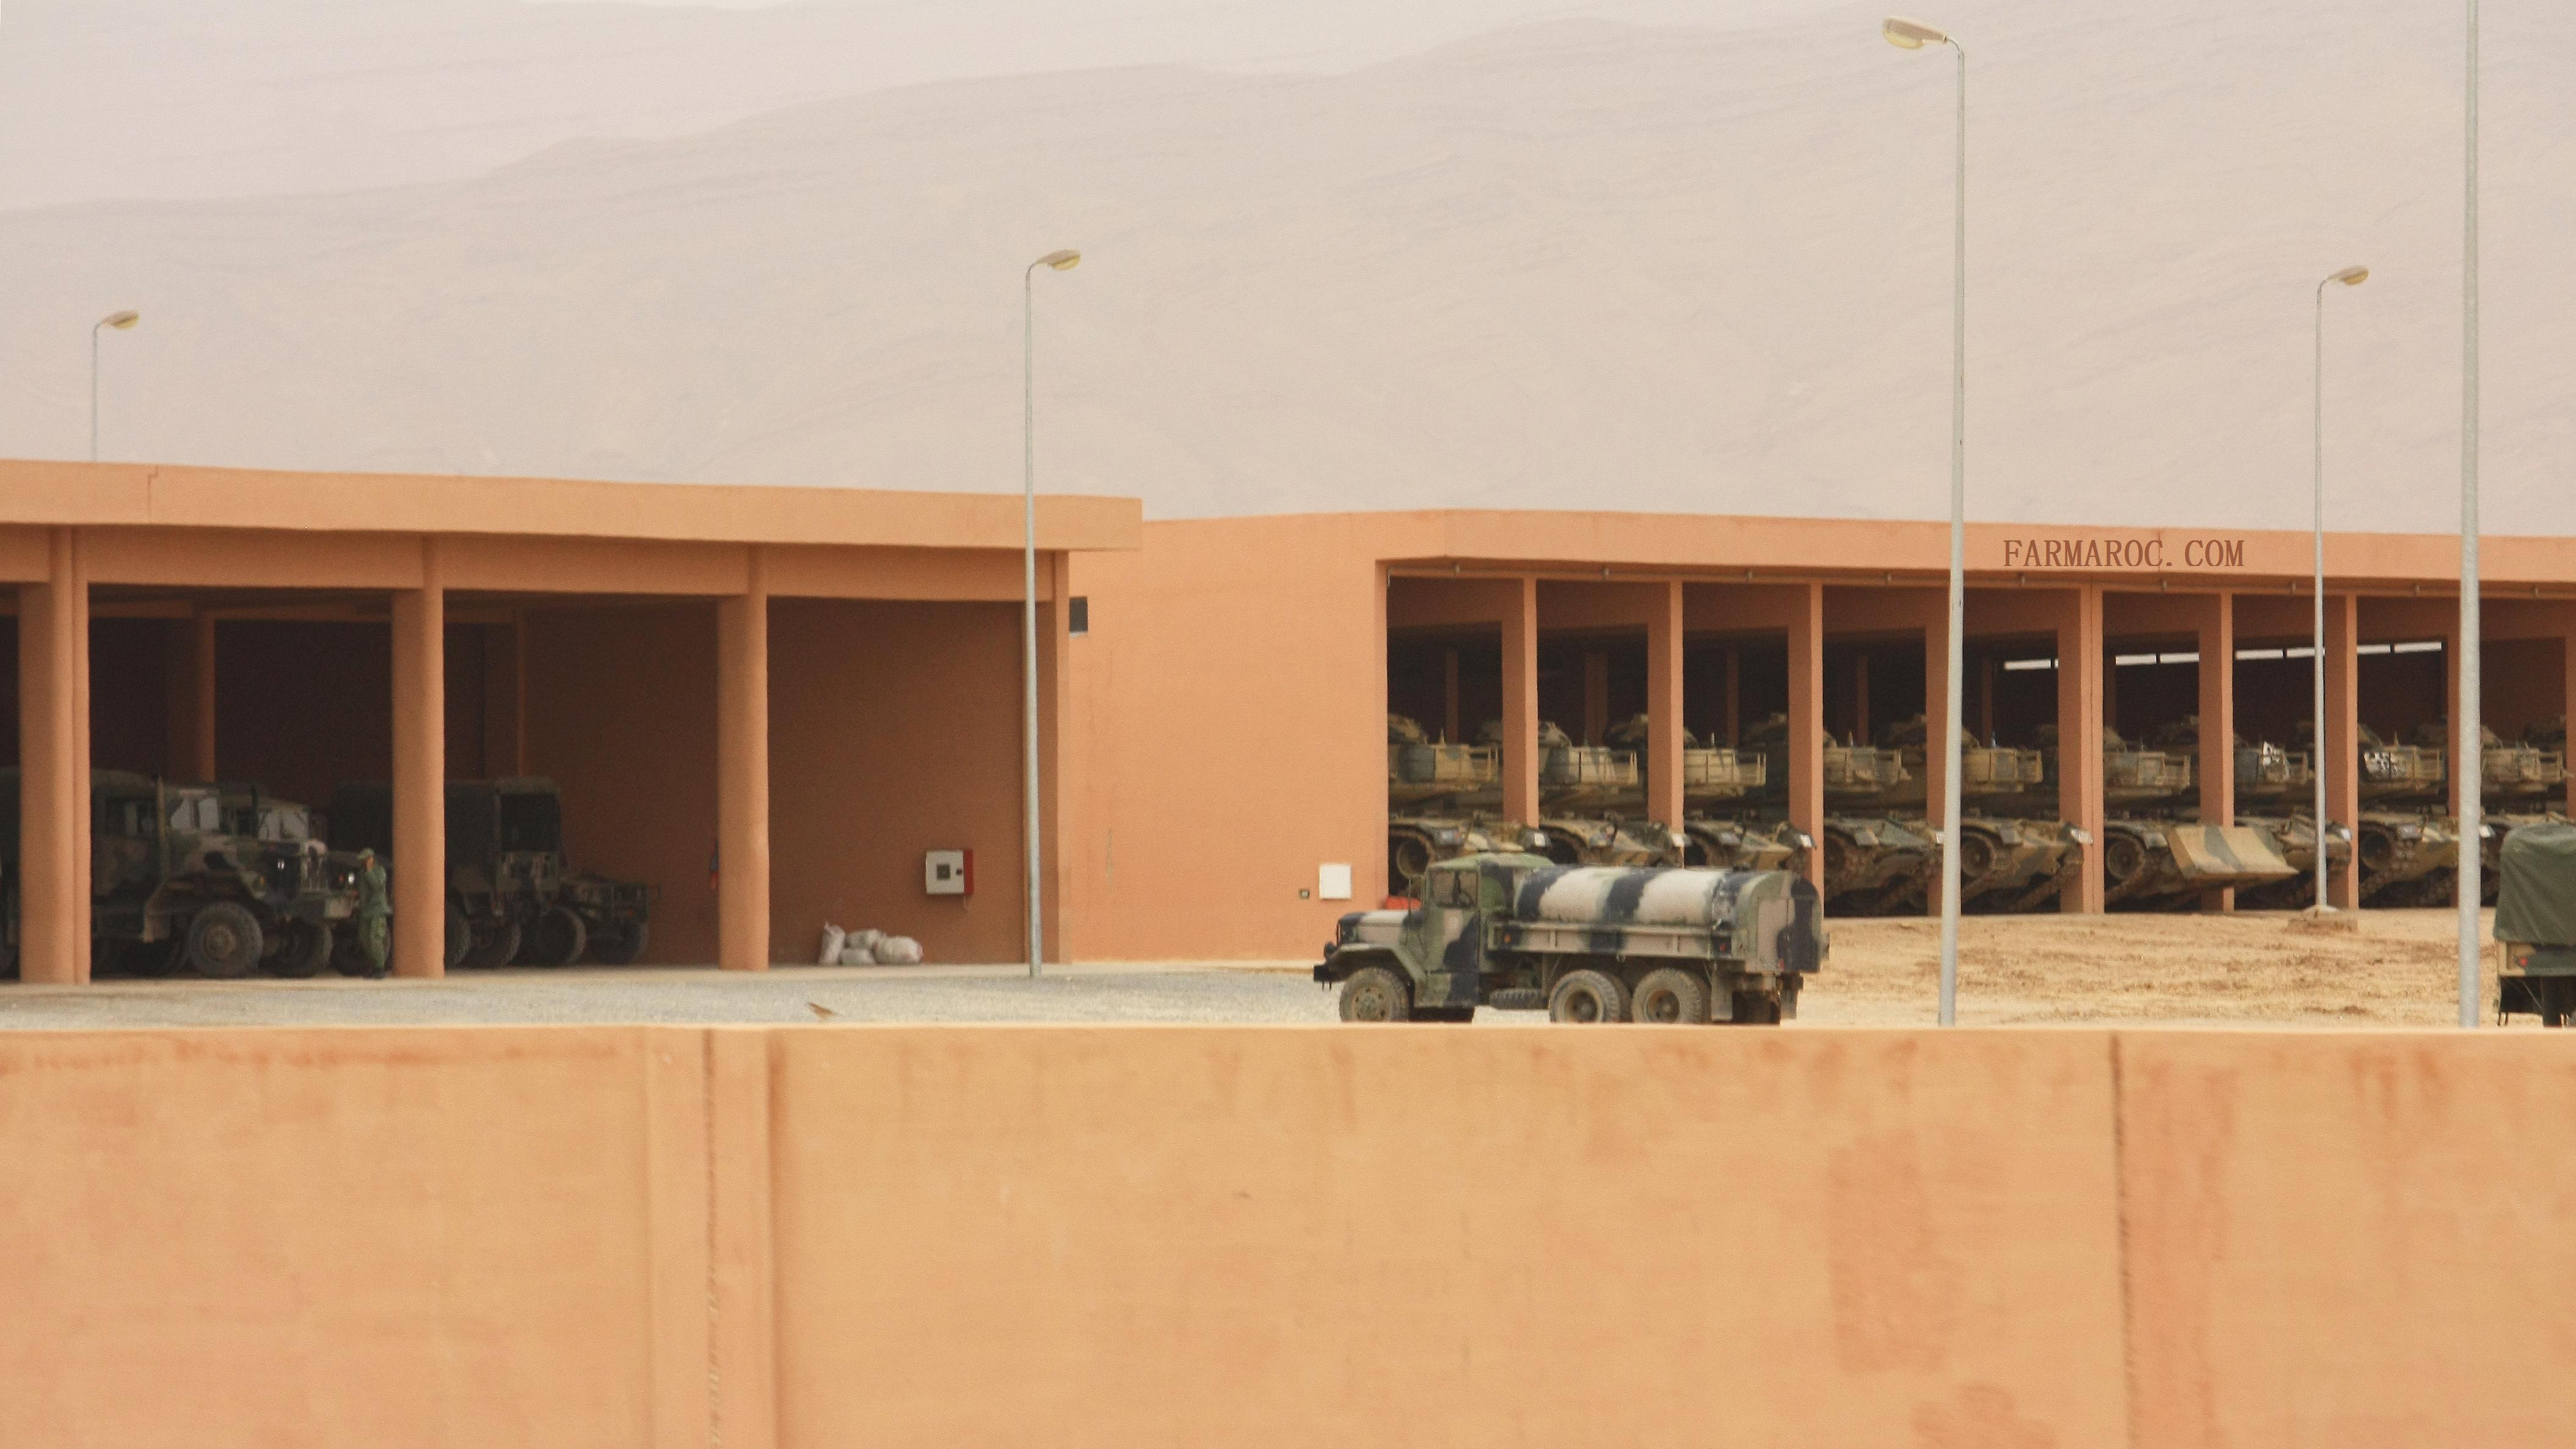 Photos - Chars de Combat / MBTs 62826193141239799c35e19a74o